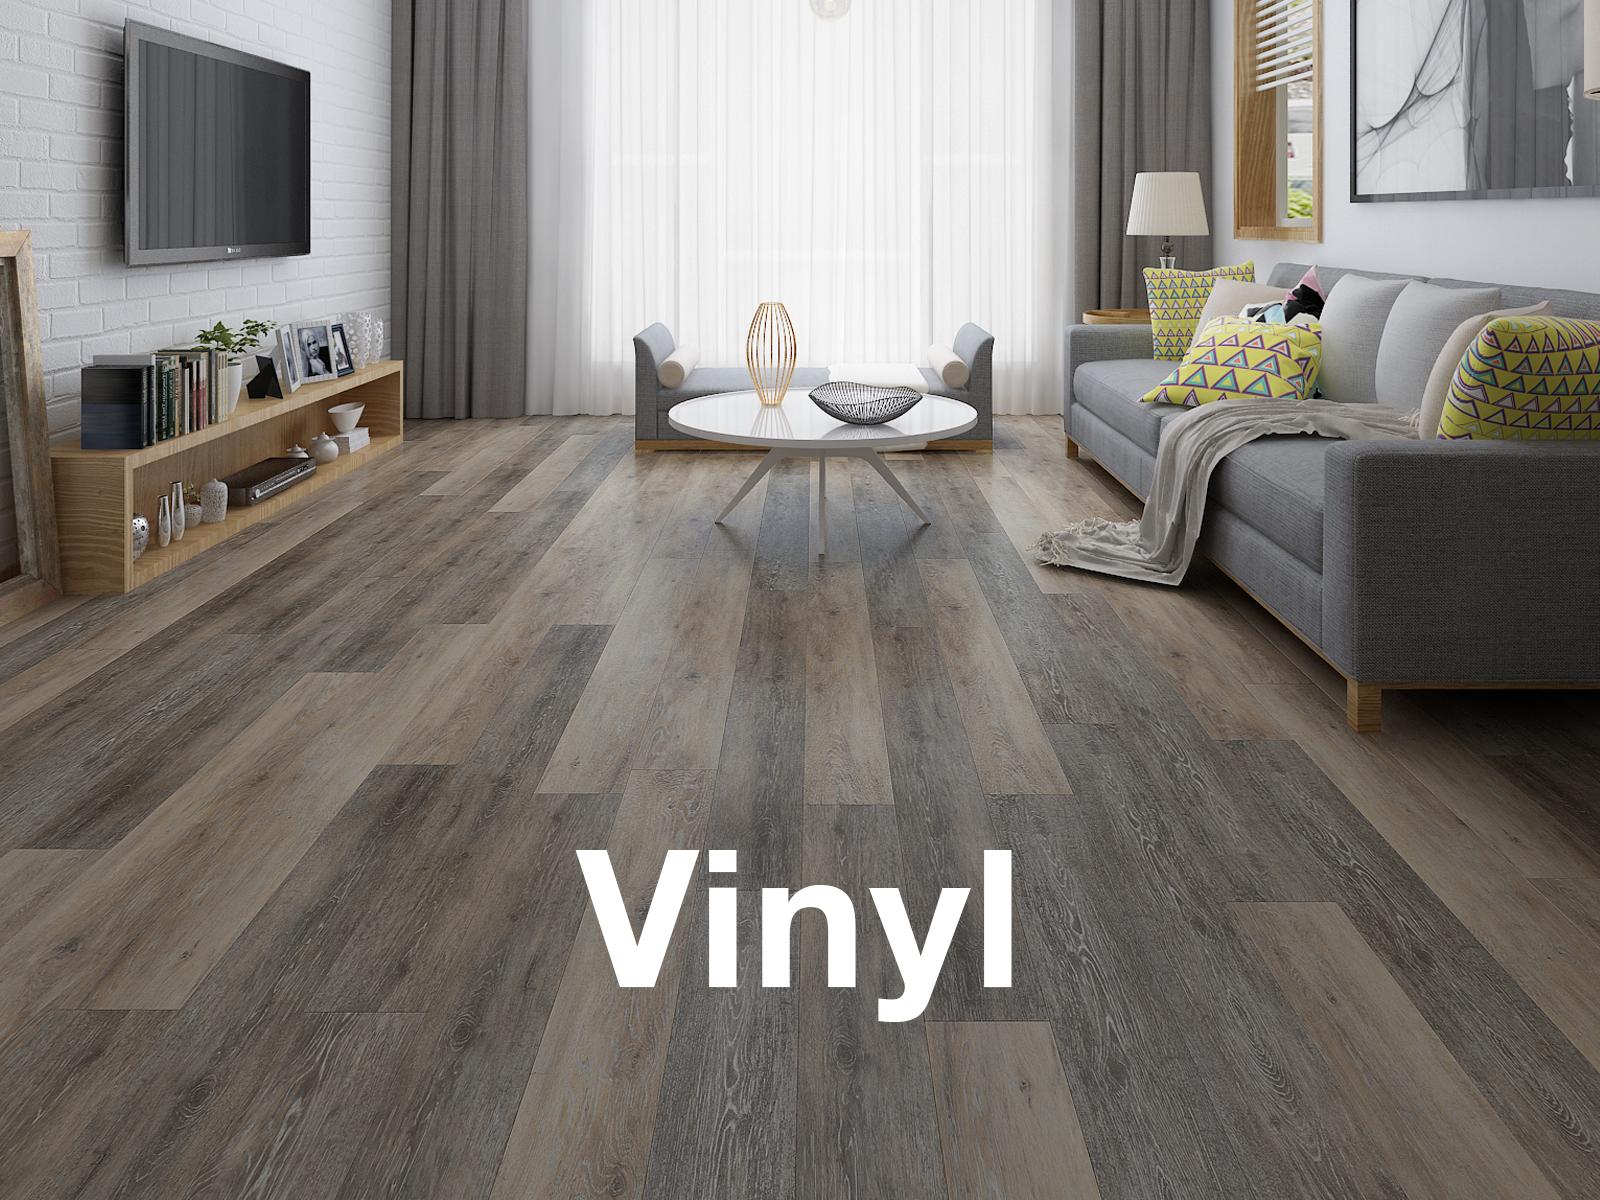 Hardwood, laminate, vinyl